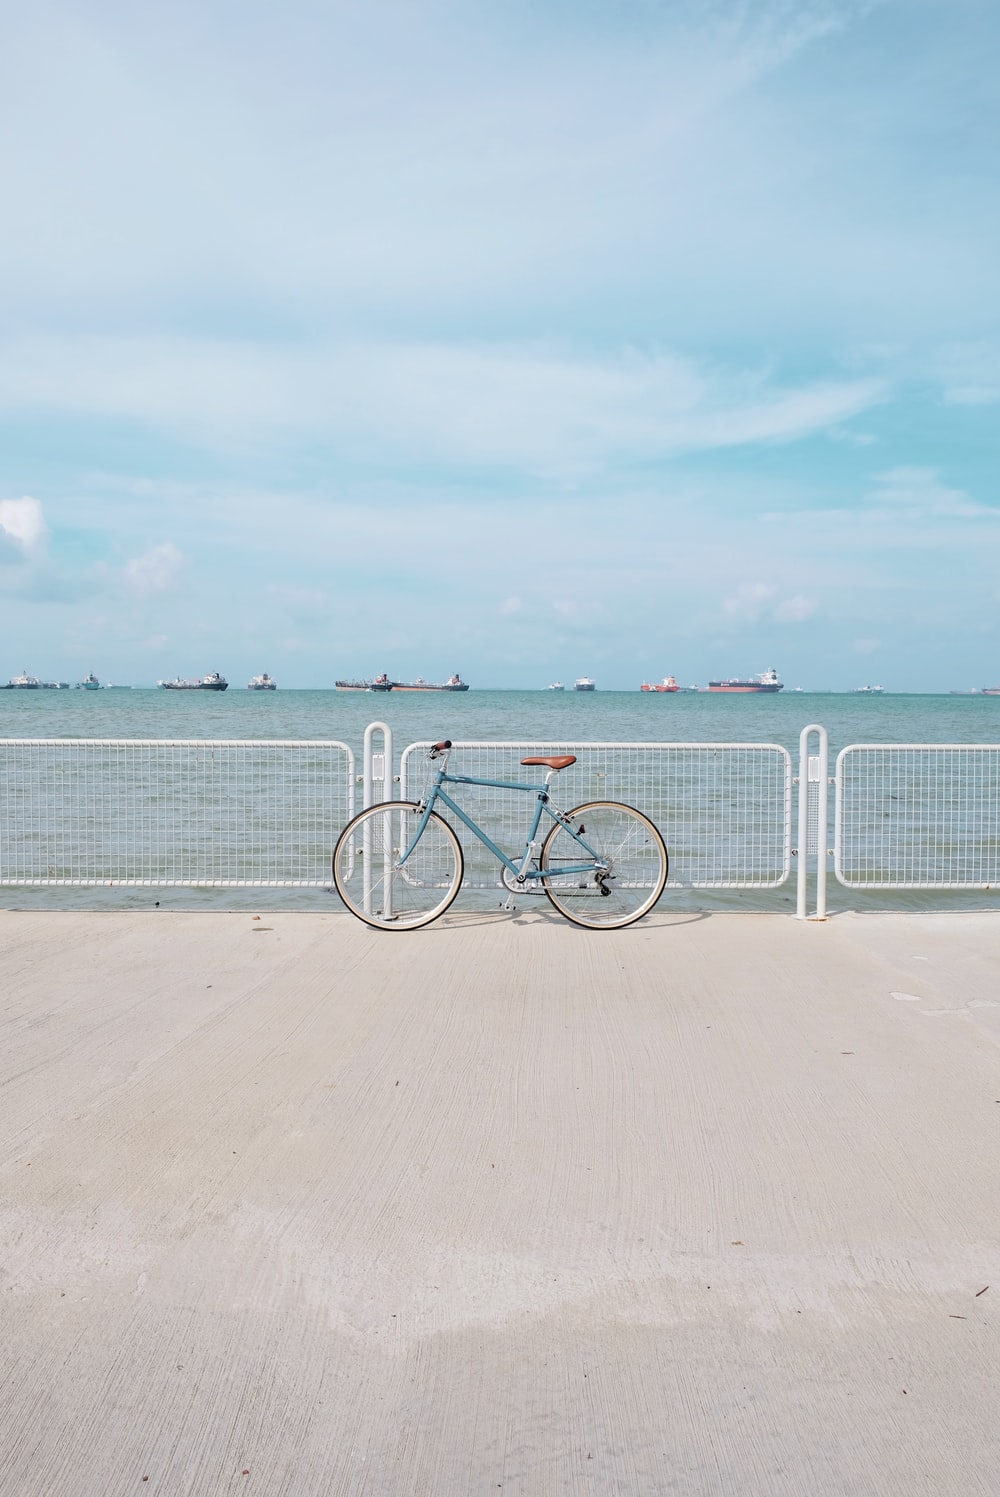 blue commuter retro bike leaning on dock railing